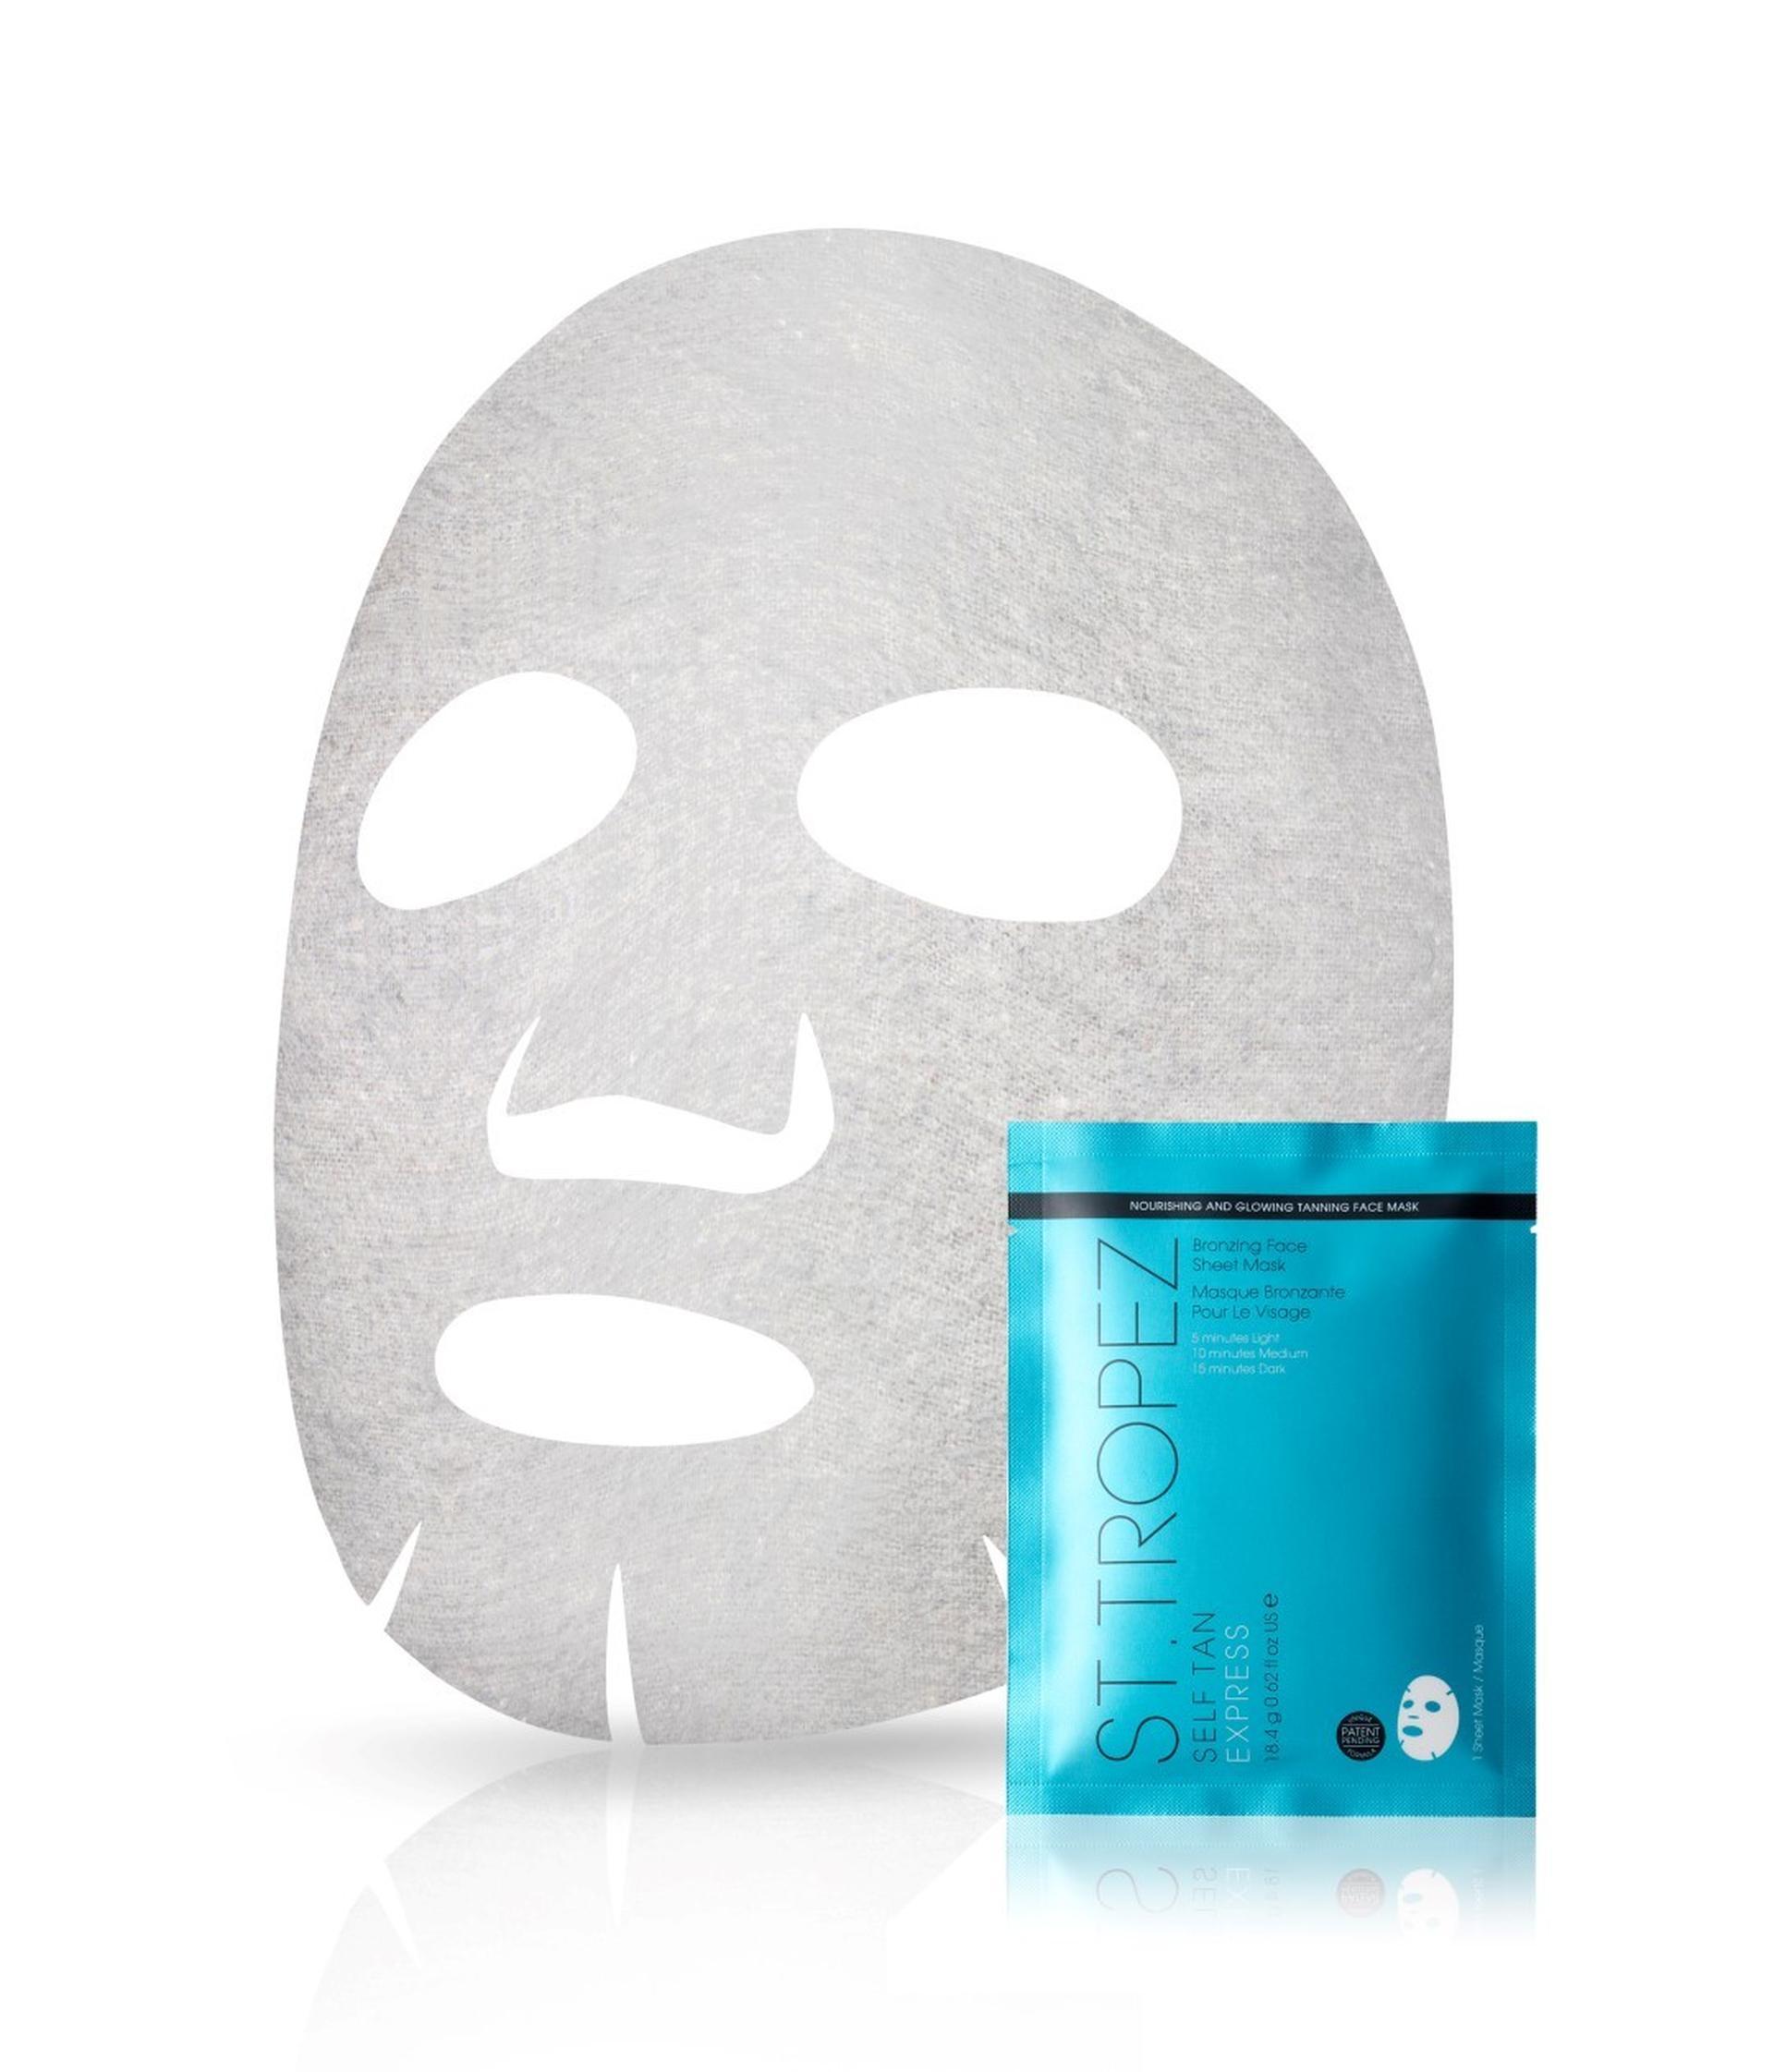 "מסכת בד לשיזוף עצמי ST.TROPEZ Self Tan Express Face Sheet Mask יח""צ"